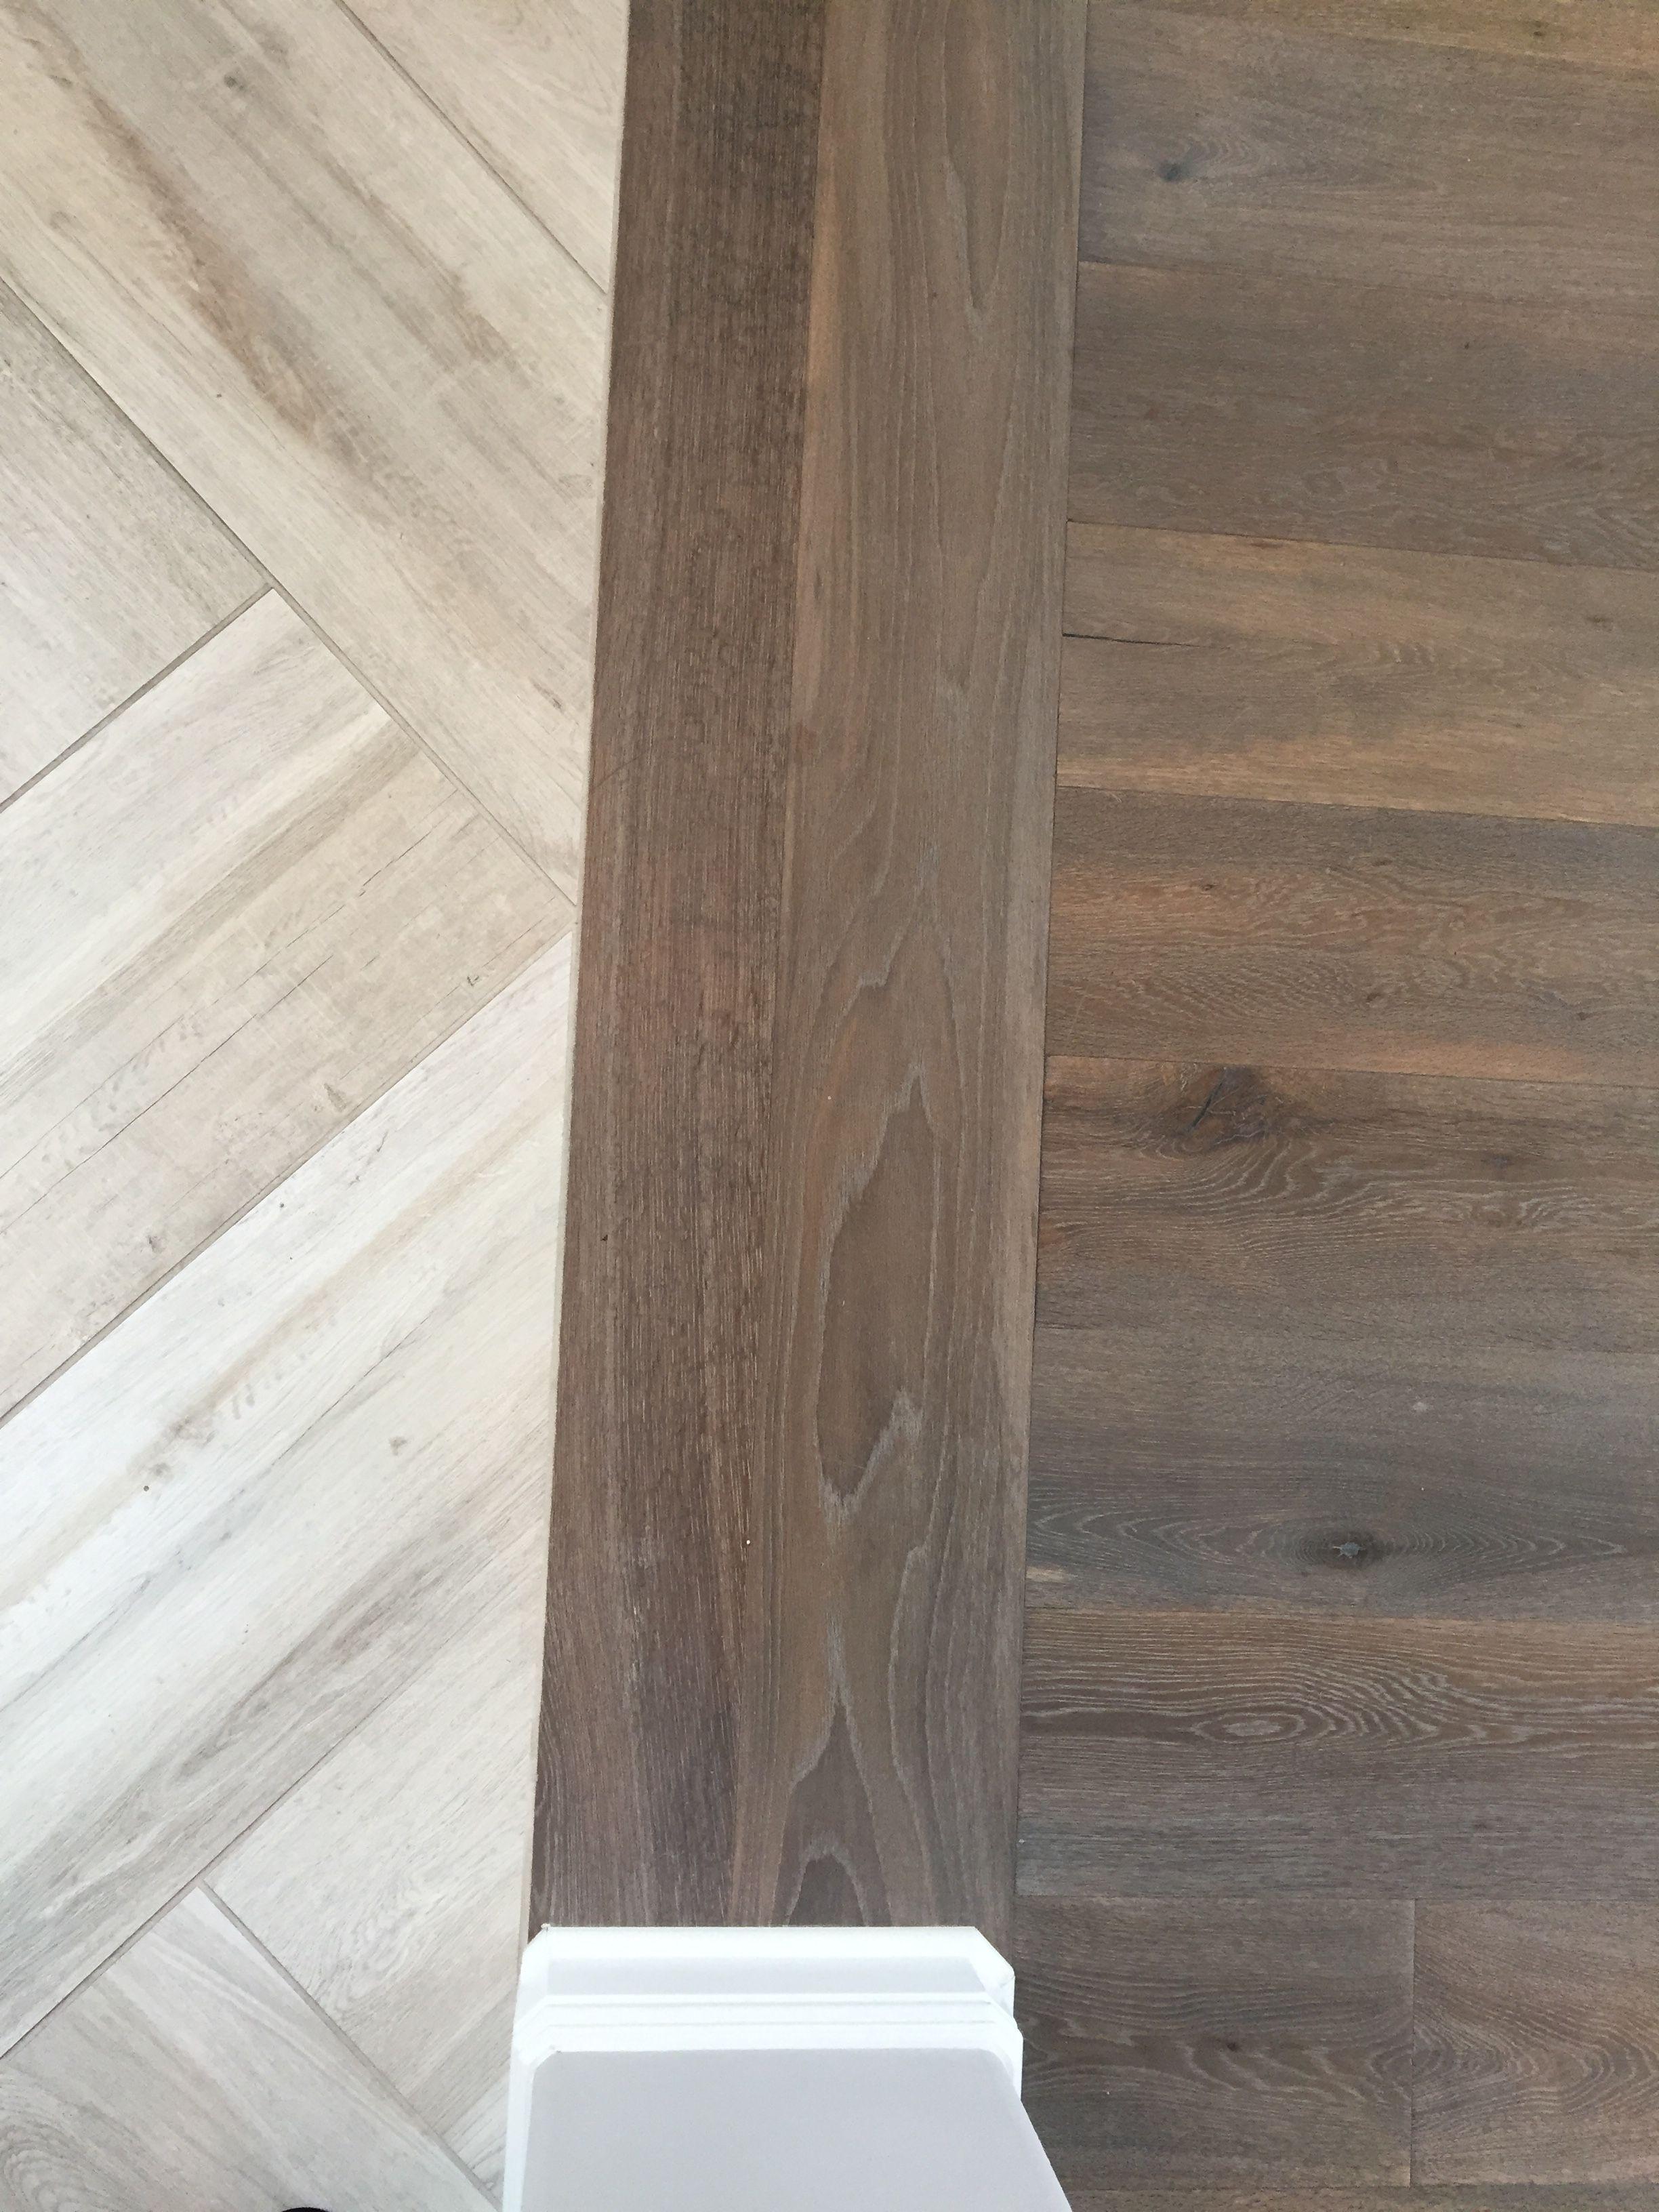 glue down prefinished hardwood flooring of floor transition laminate to herringbone tile pattern model for floor transition laminate to herringbone tile pattern herringbone tile pattern herringbone wood floor